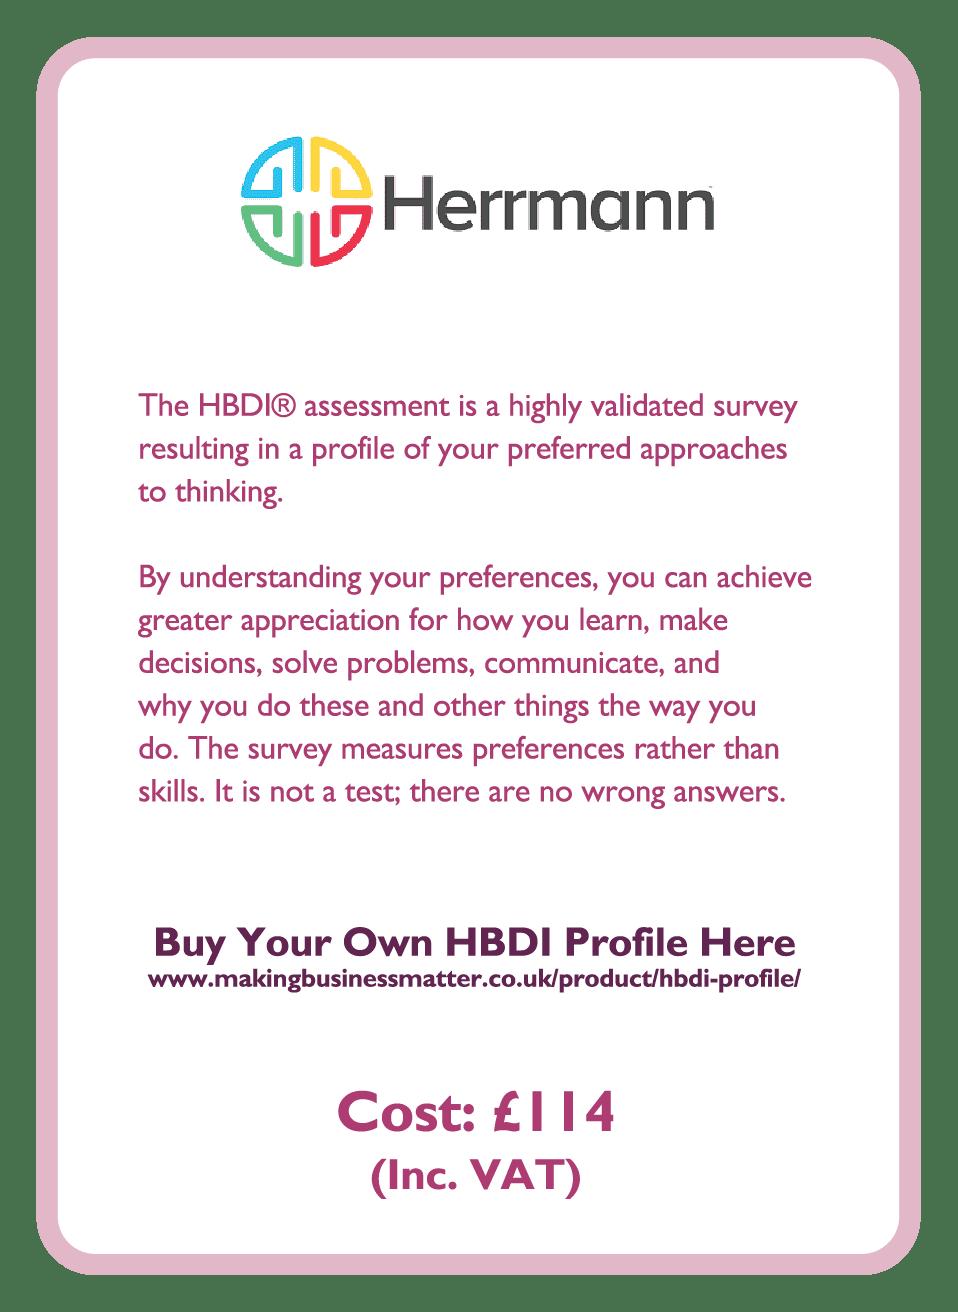 Coaching card titled Hermann